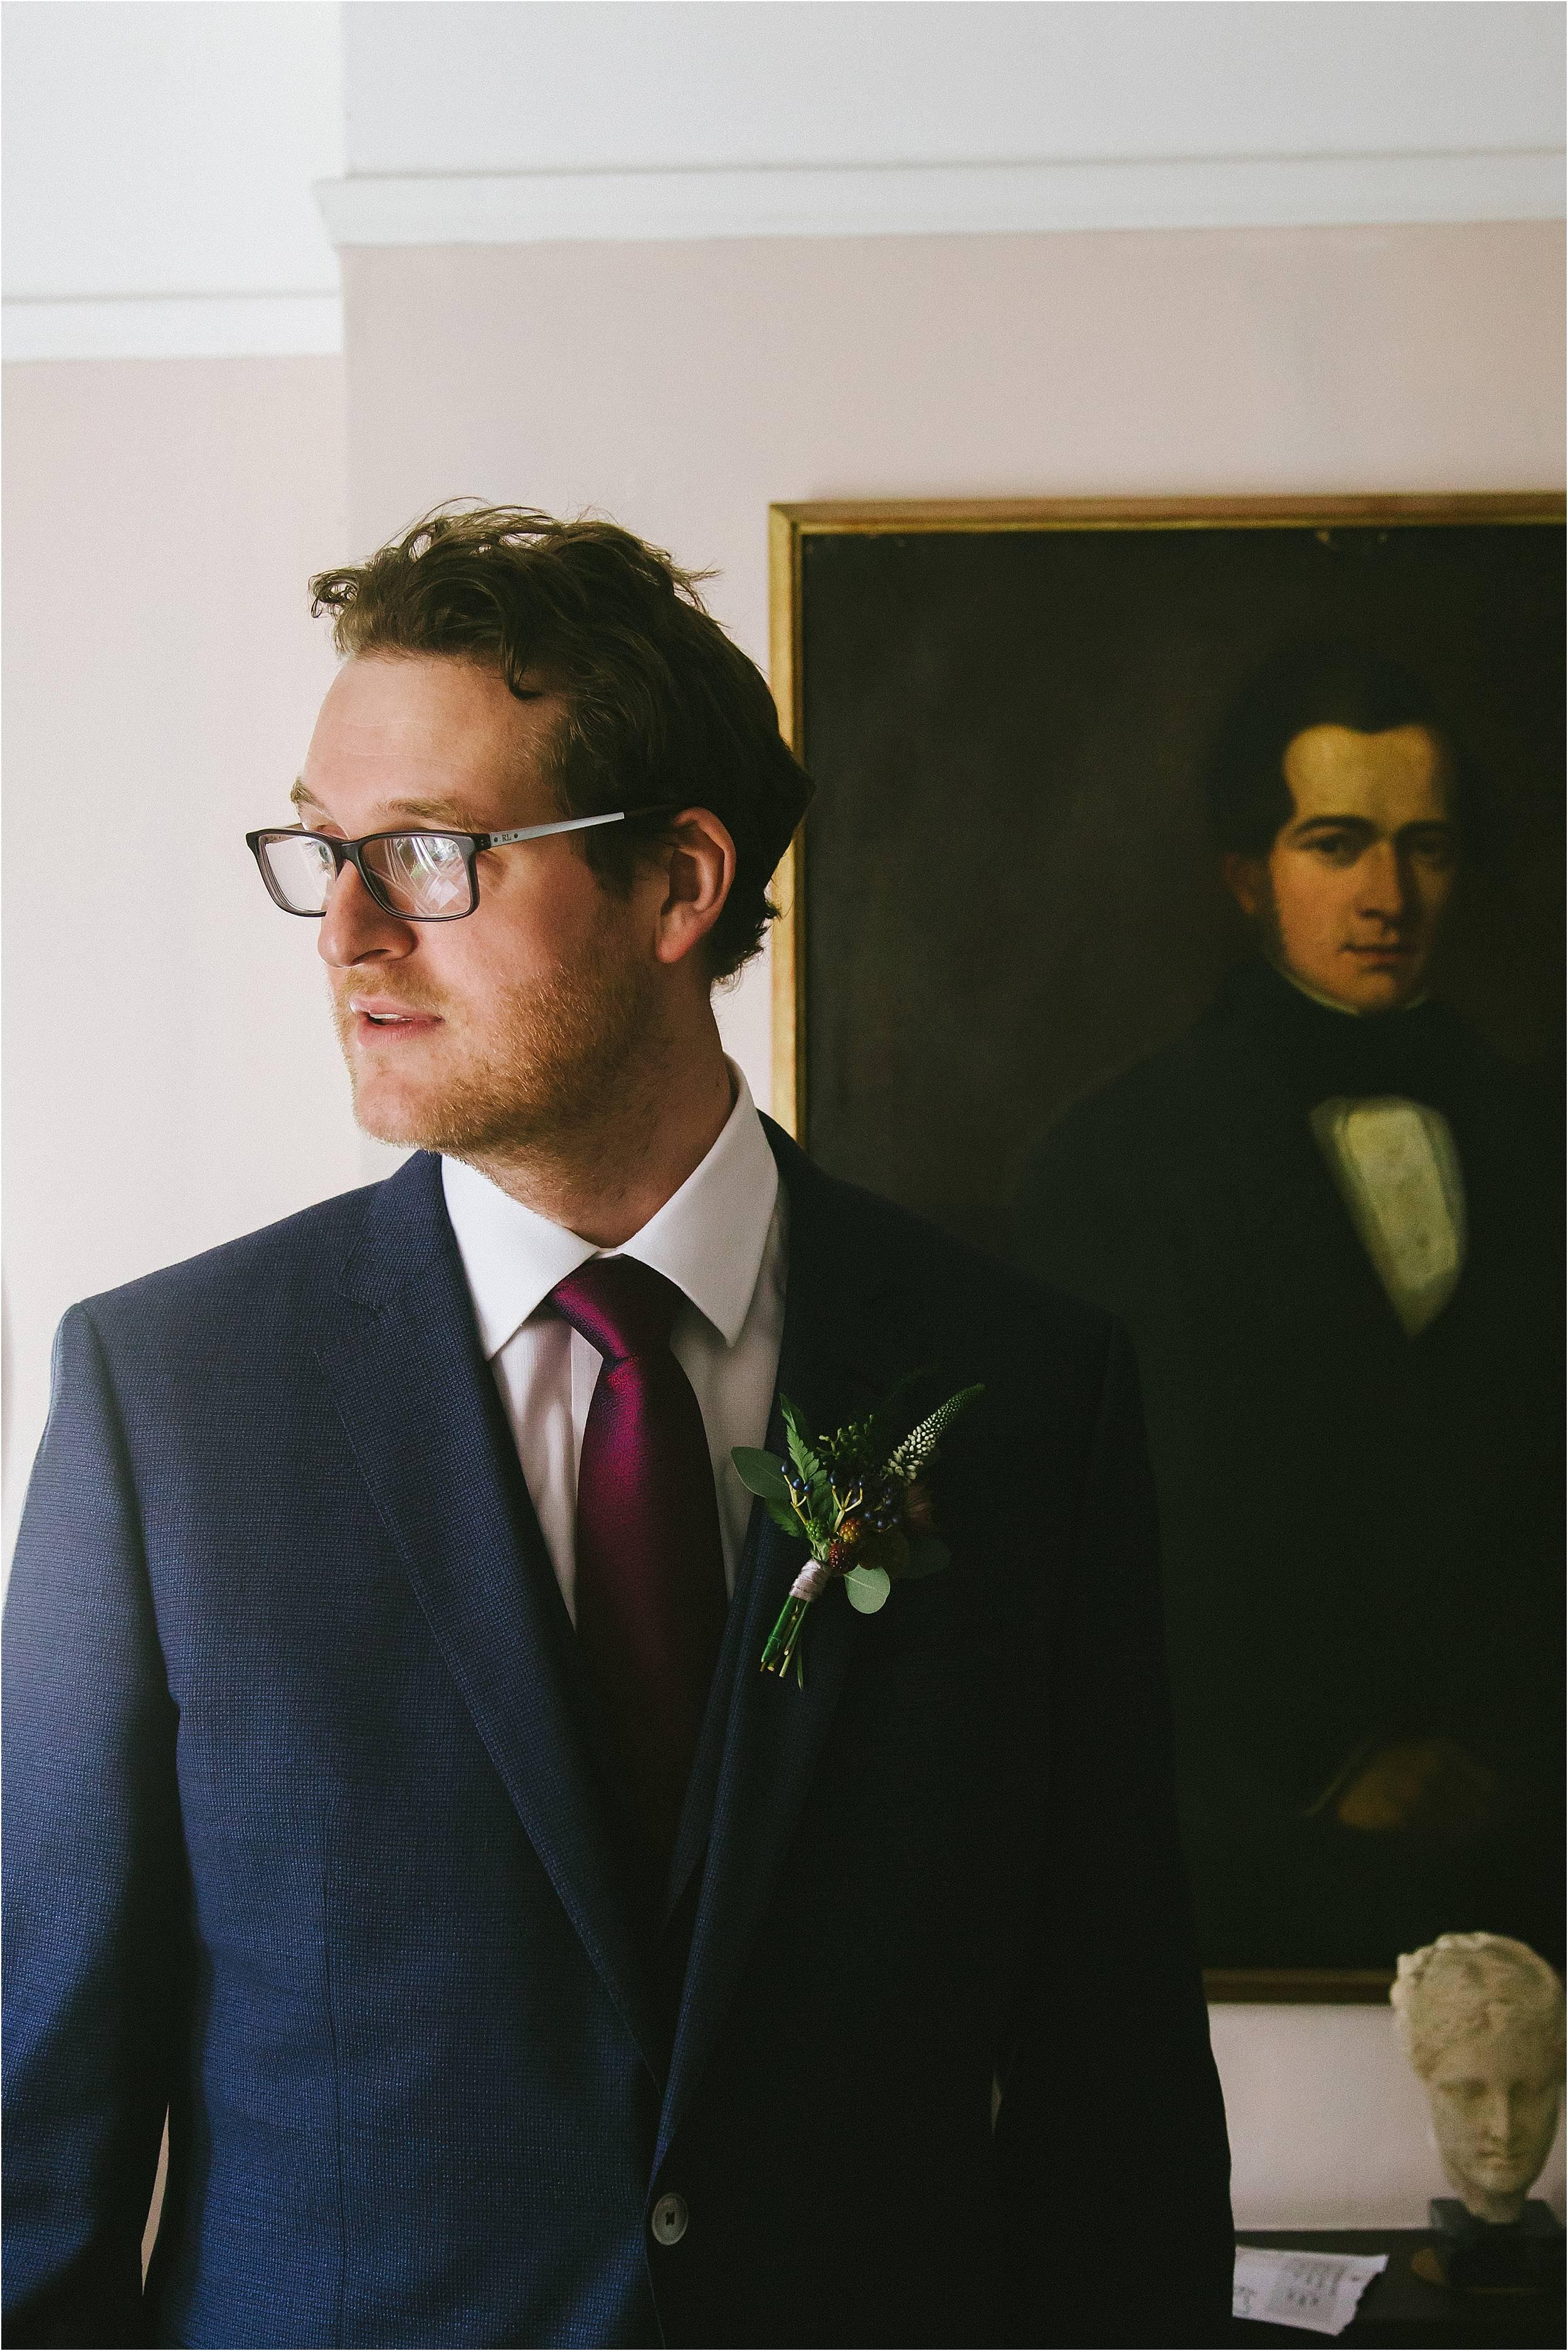 Oxford Ashmolean Museum Wedding Photography_0033.jpg